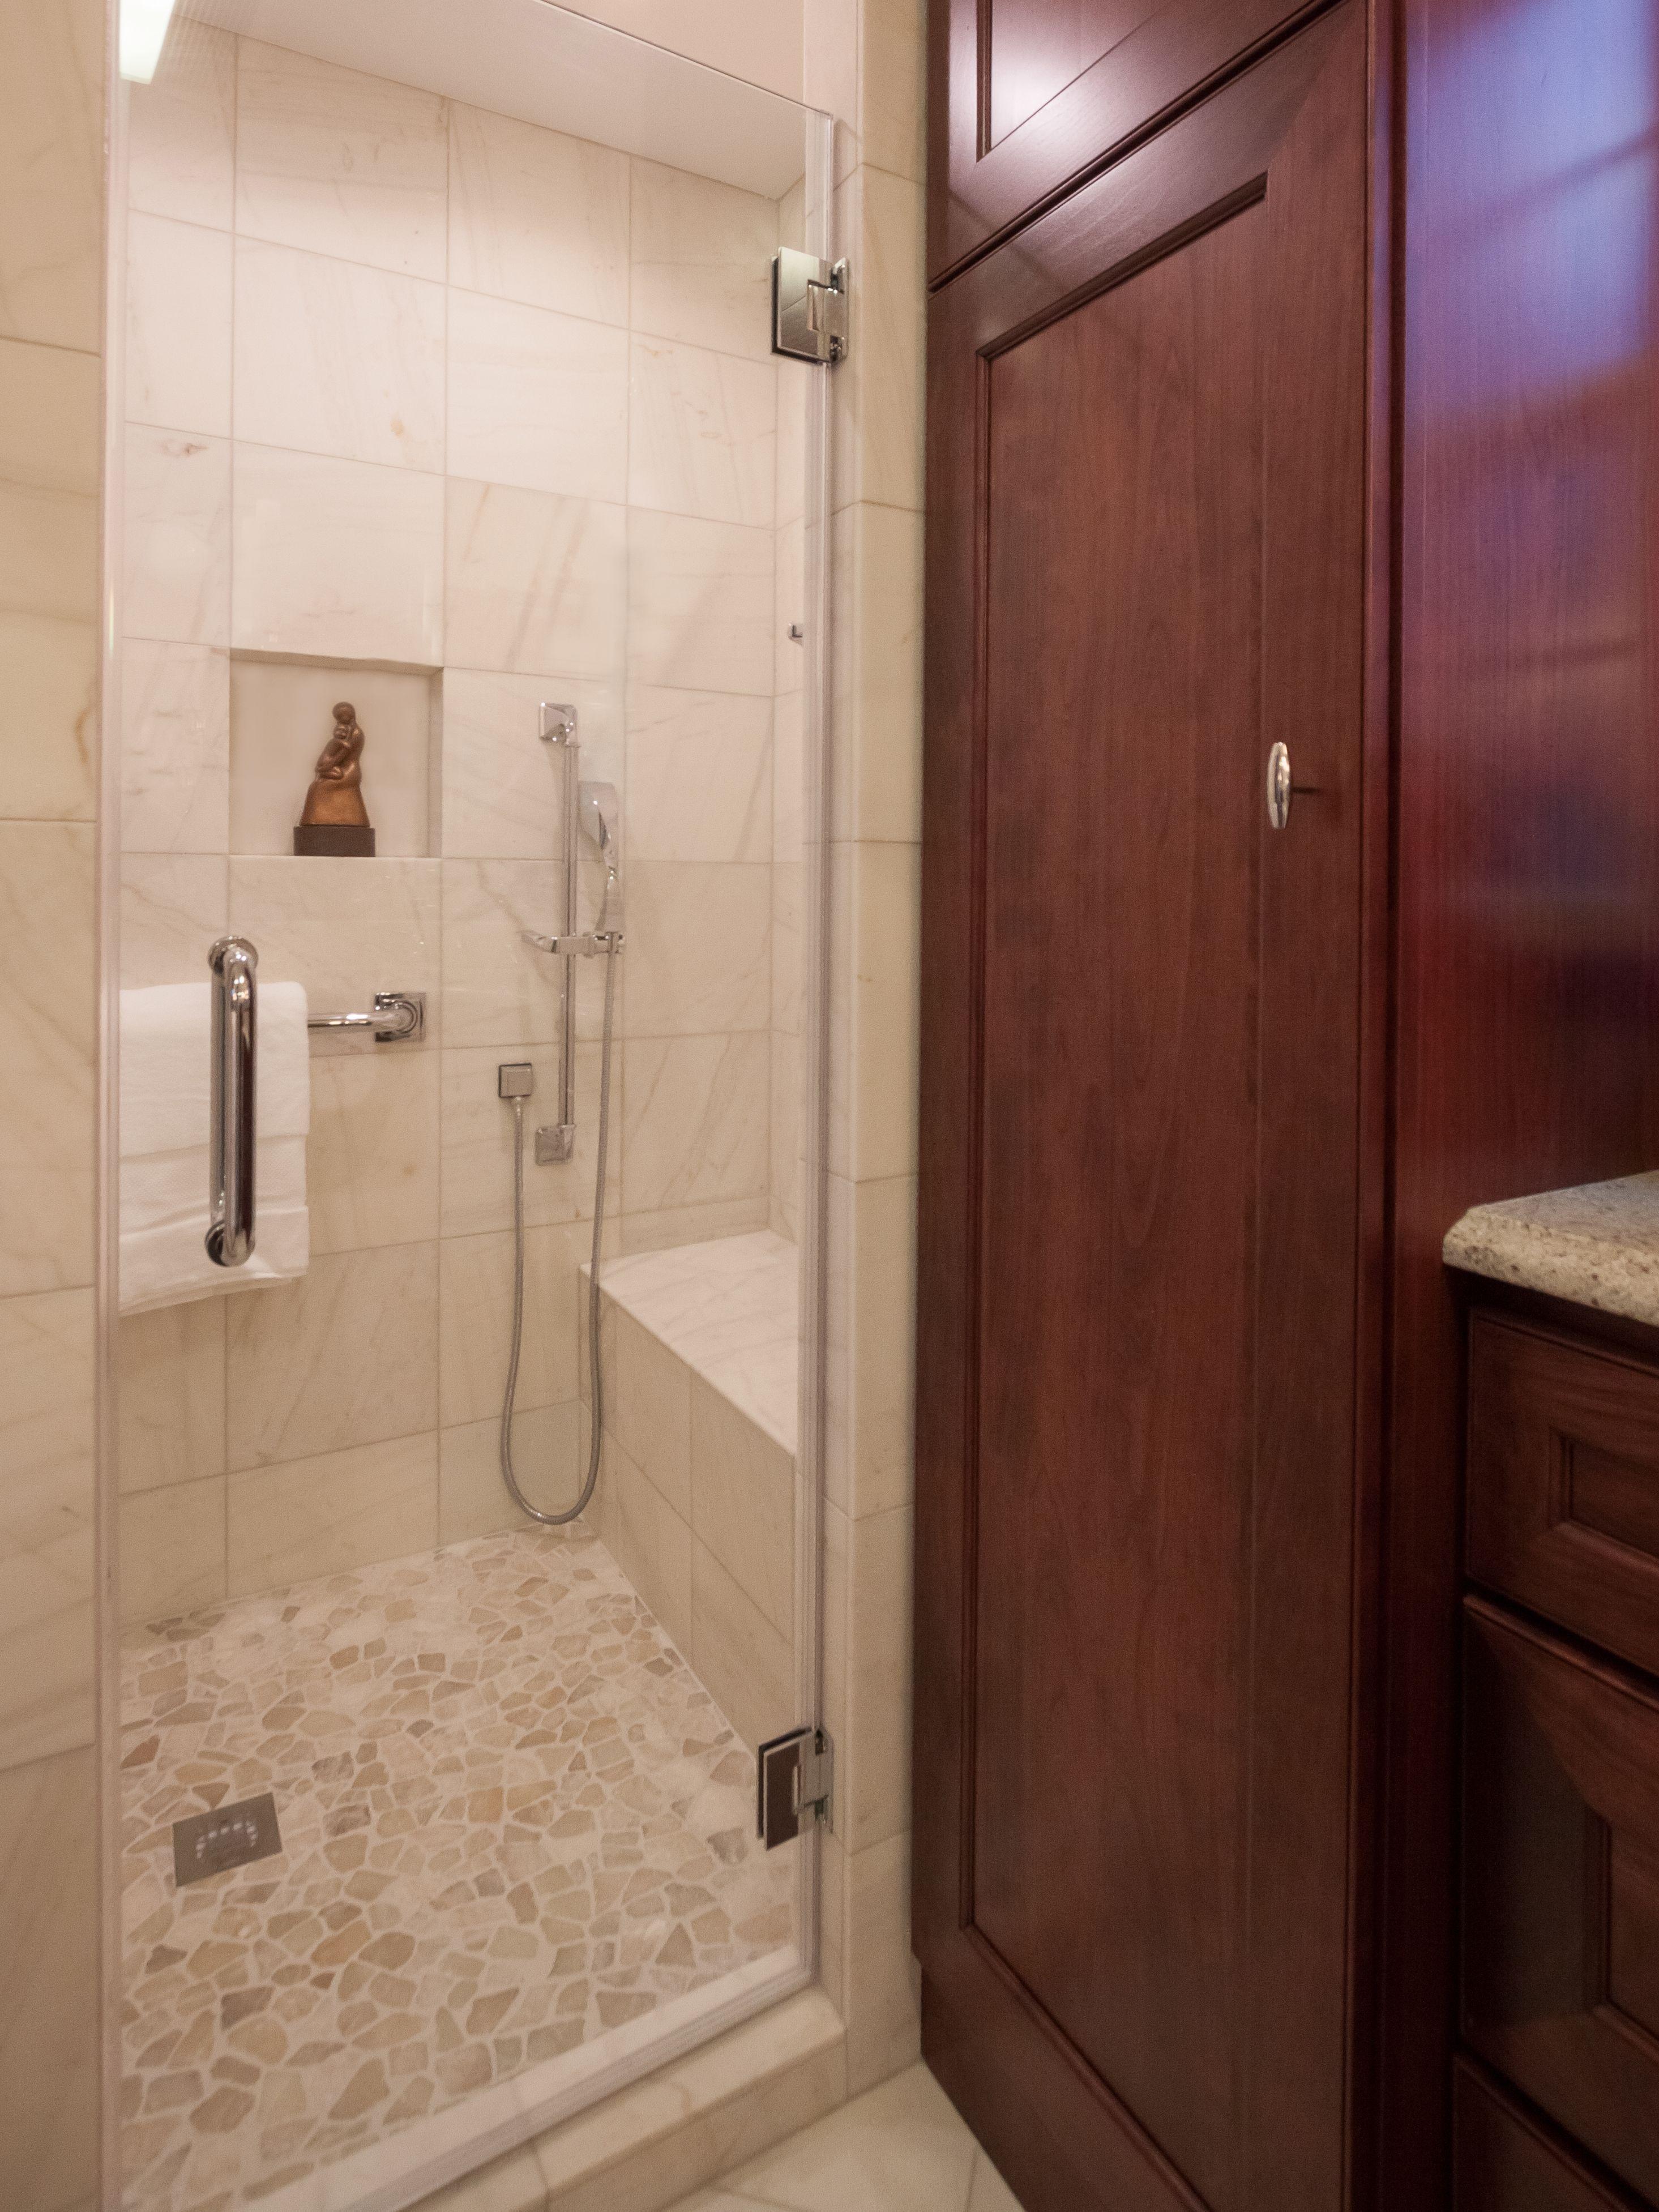 Roomy standing shower renovation. | Bathrooms | Pinterest | Standing ...